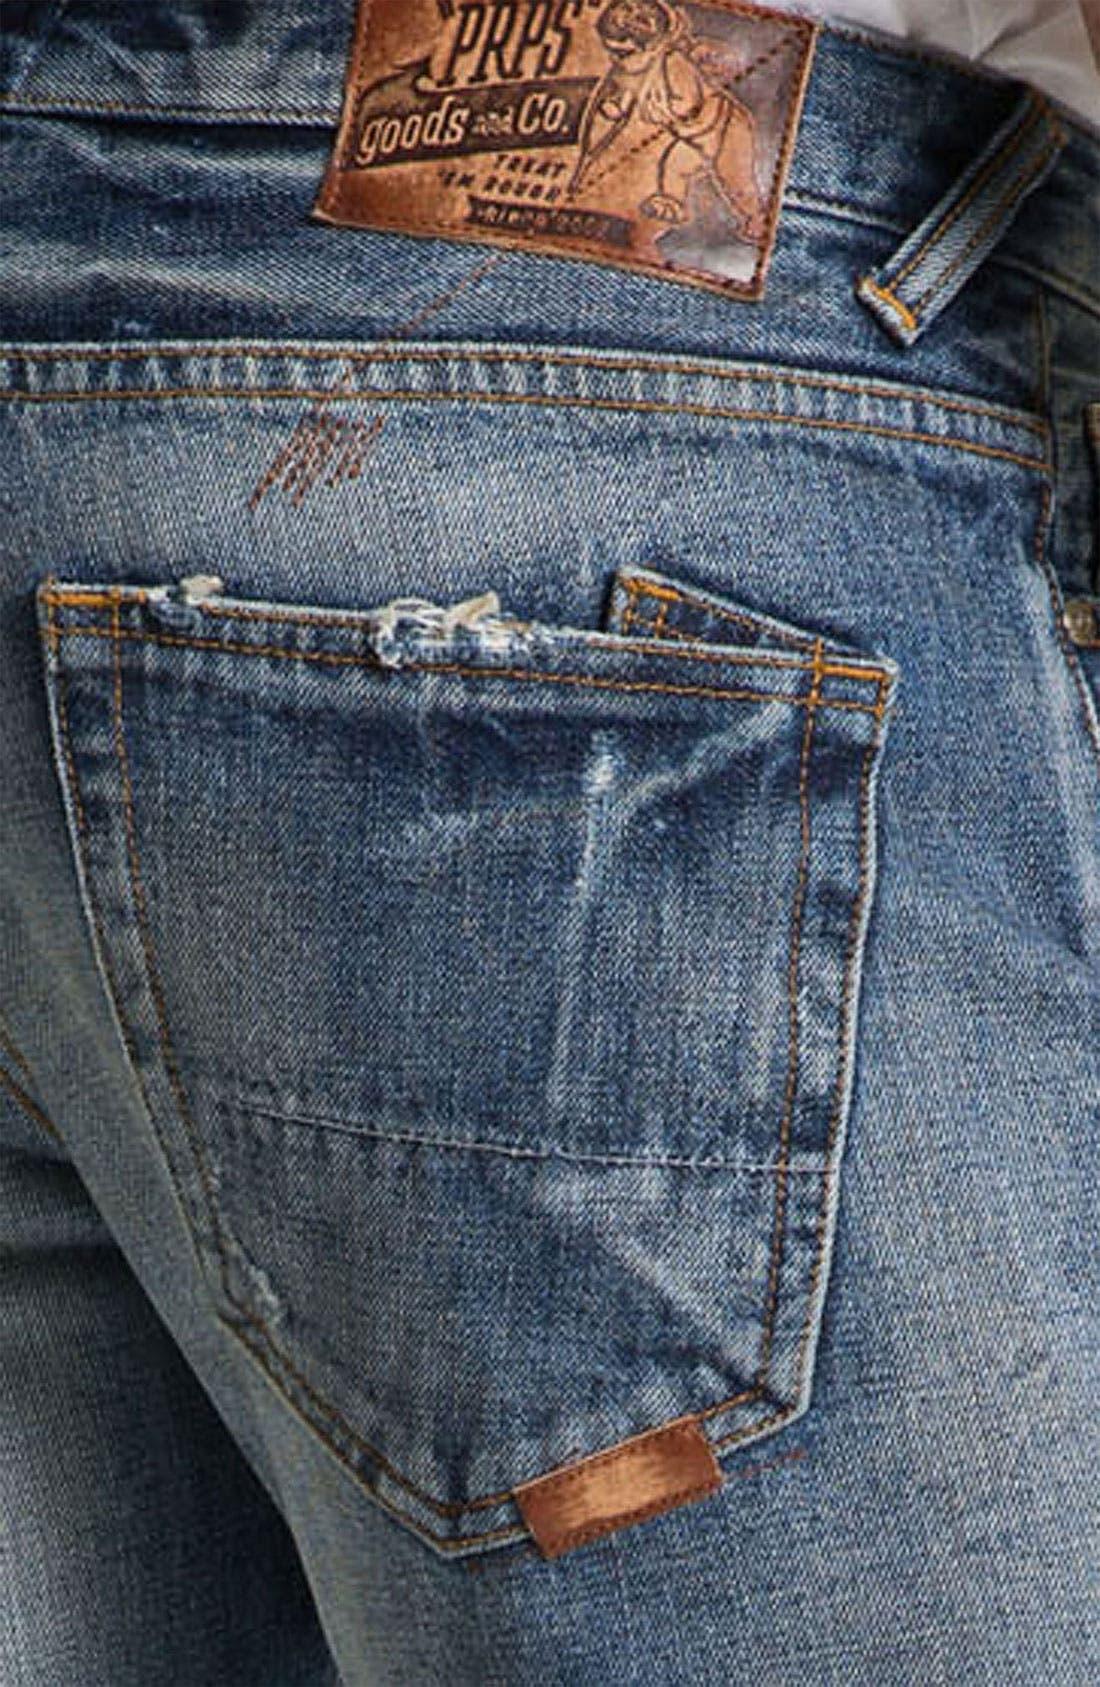 Alternate Image 4  - PRPS 'Barracuda' Straight Leg Jeans (Light Wash)